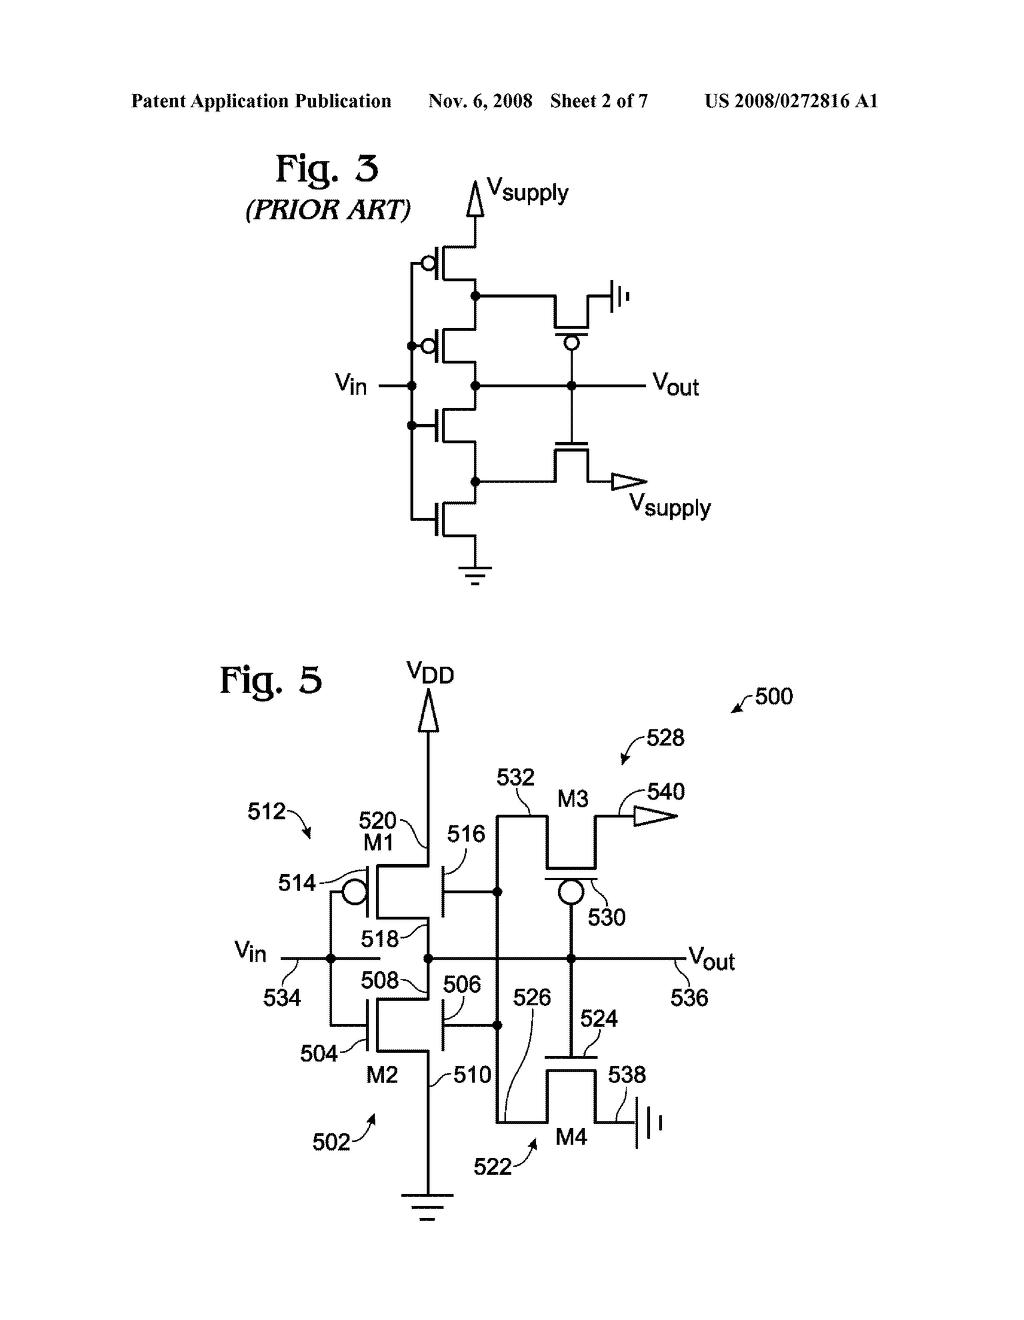 Schmitt Trigger Inverter Schematic Cmos 7414 Oscillator Circuit With Four Transistor Diagram